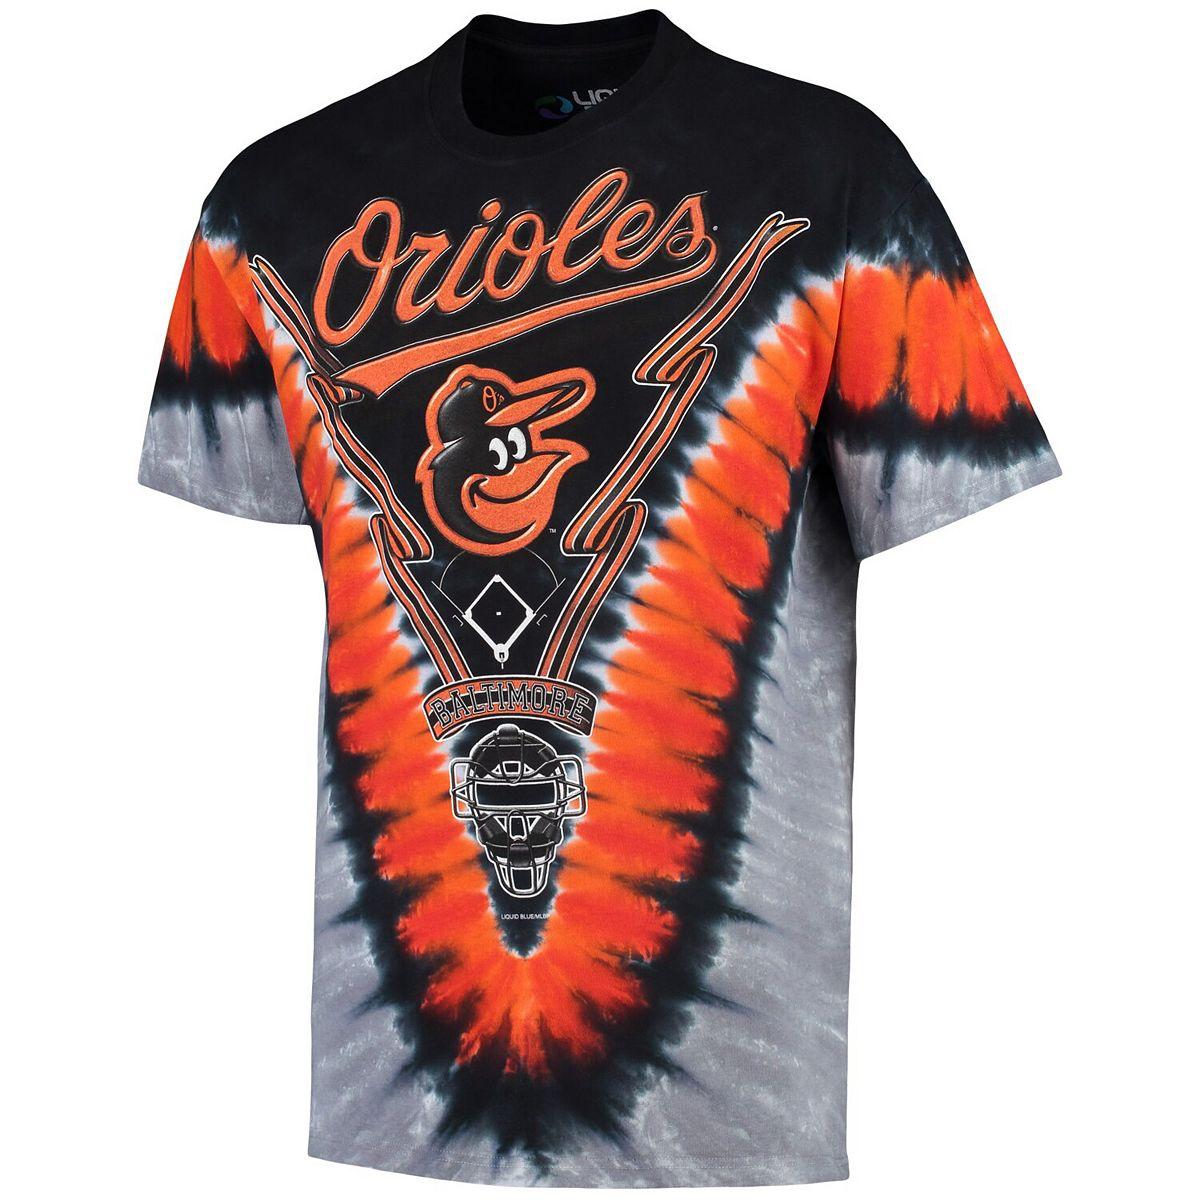 Men's Black/Orange Baltimore Orioles V Tie-Dye T-Shirt Lmy24